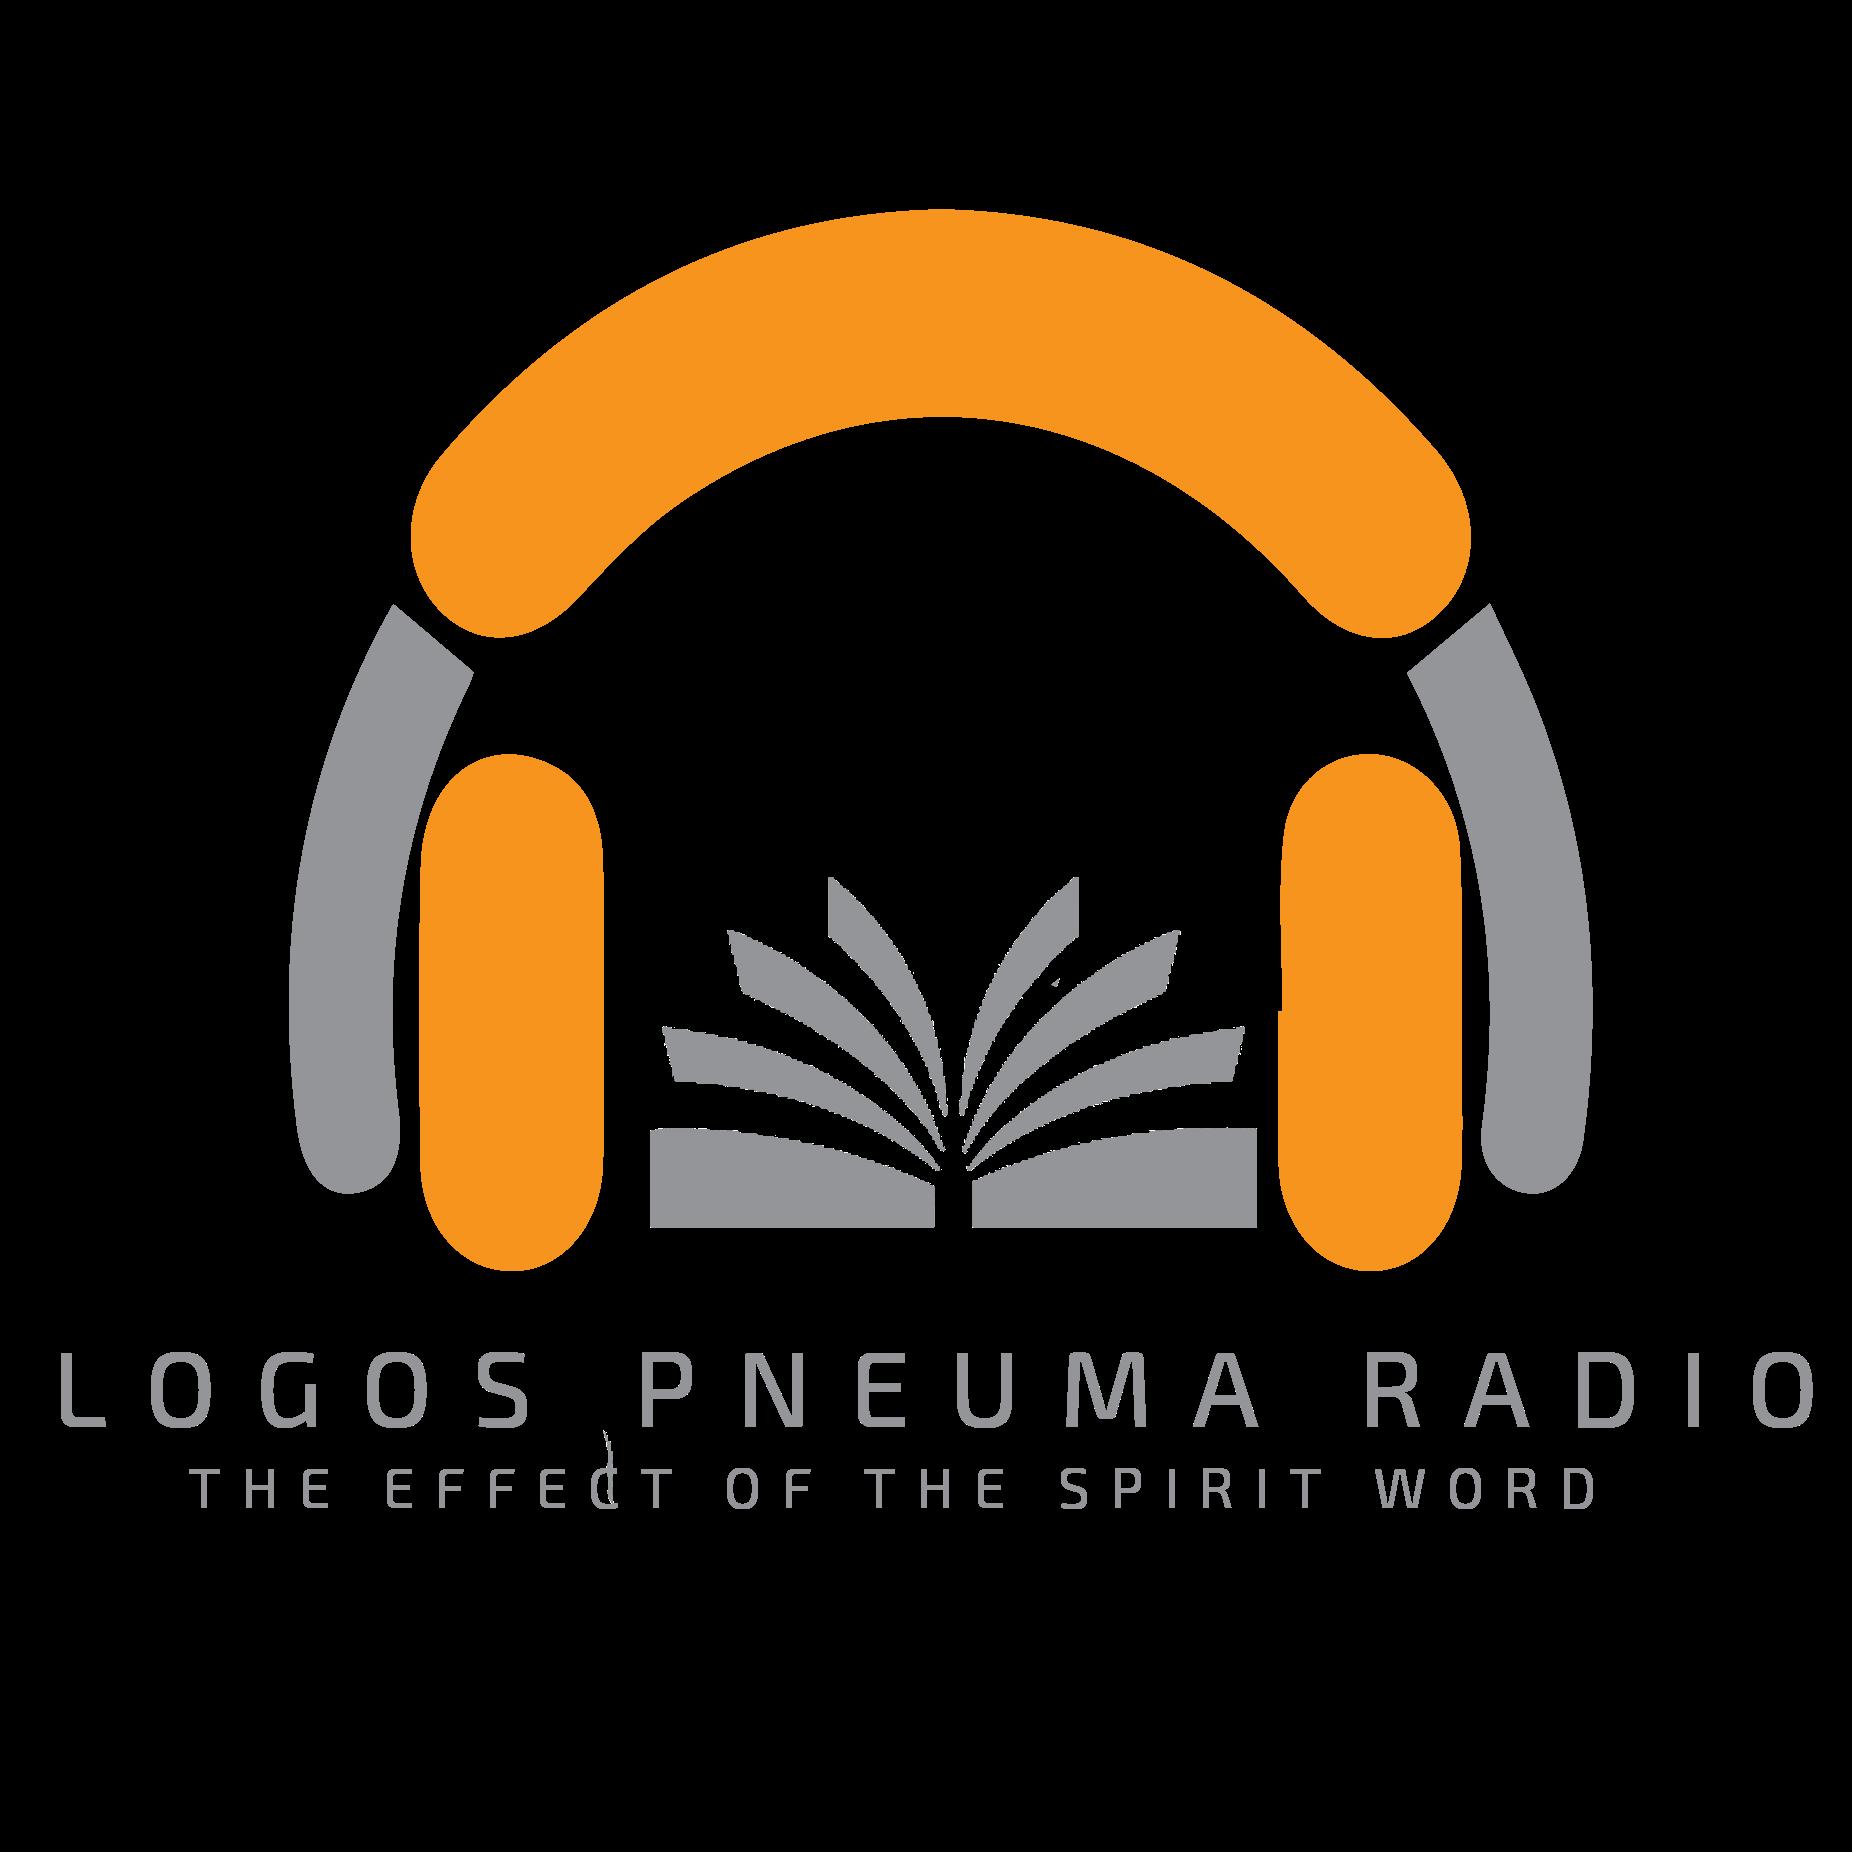 Logos Pneuma Radio